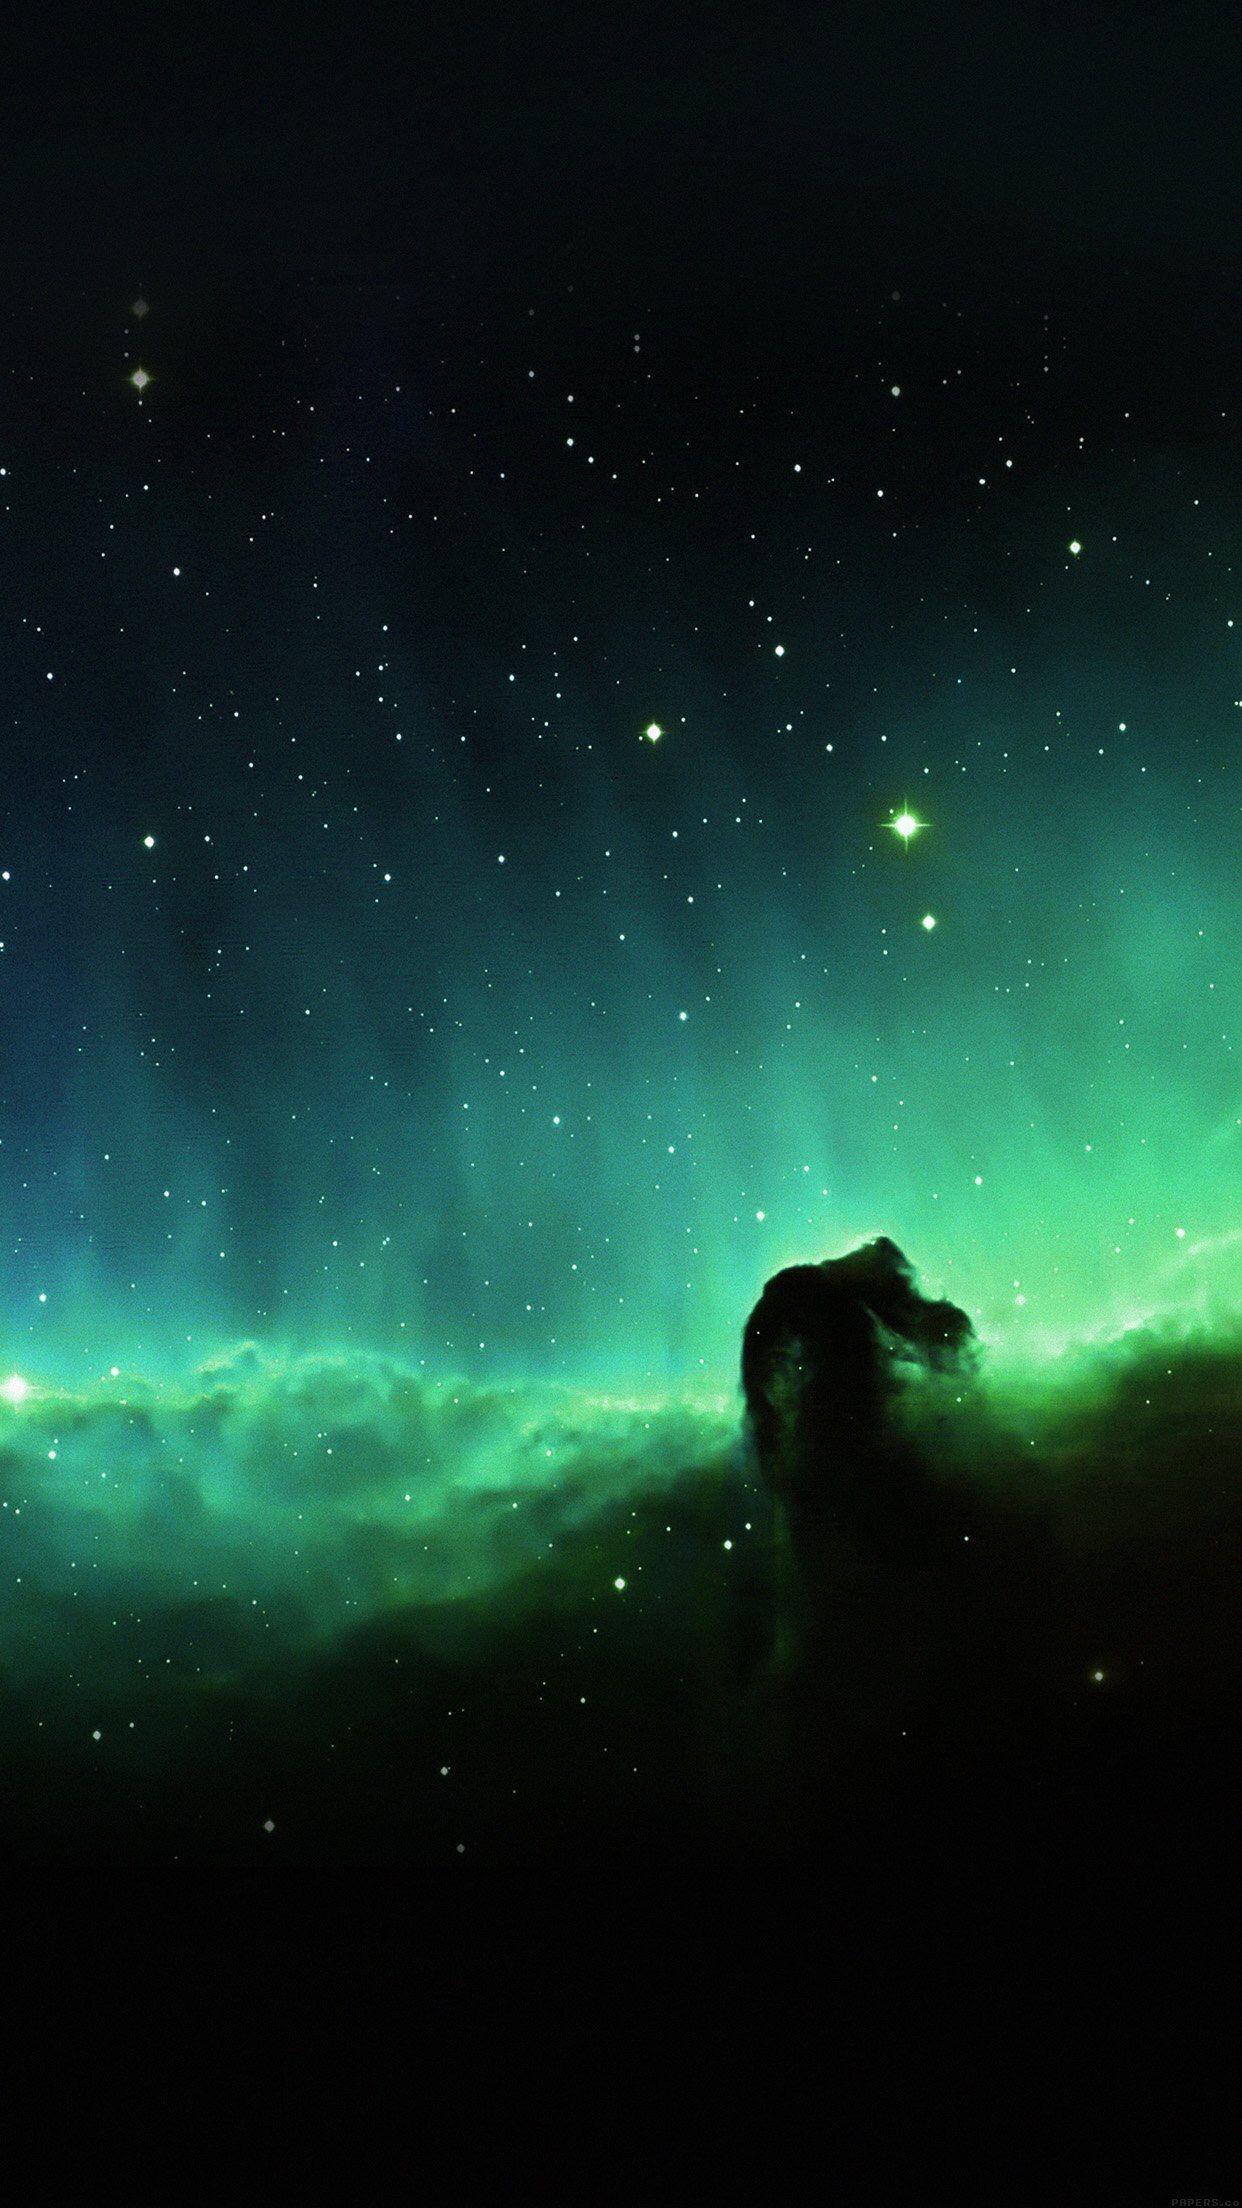 Iphone Nebula Stars Live Wallpaper Best Live Wallpapers Iphone X 577x1080 Download Hd Wallpaper Wallpapertip